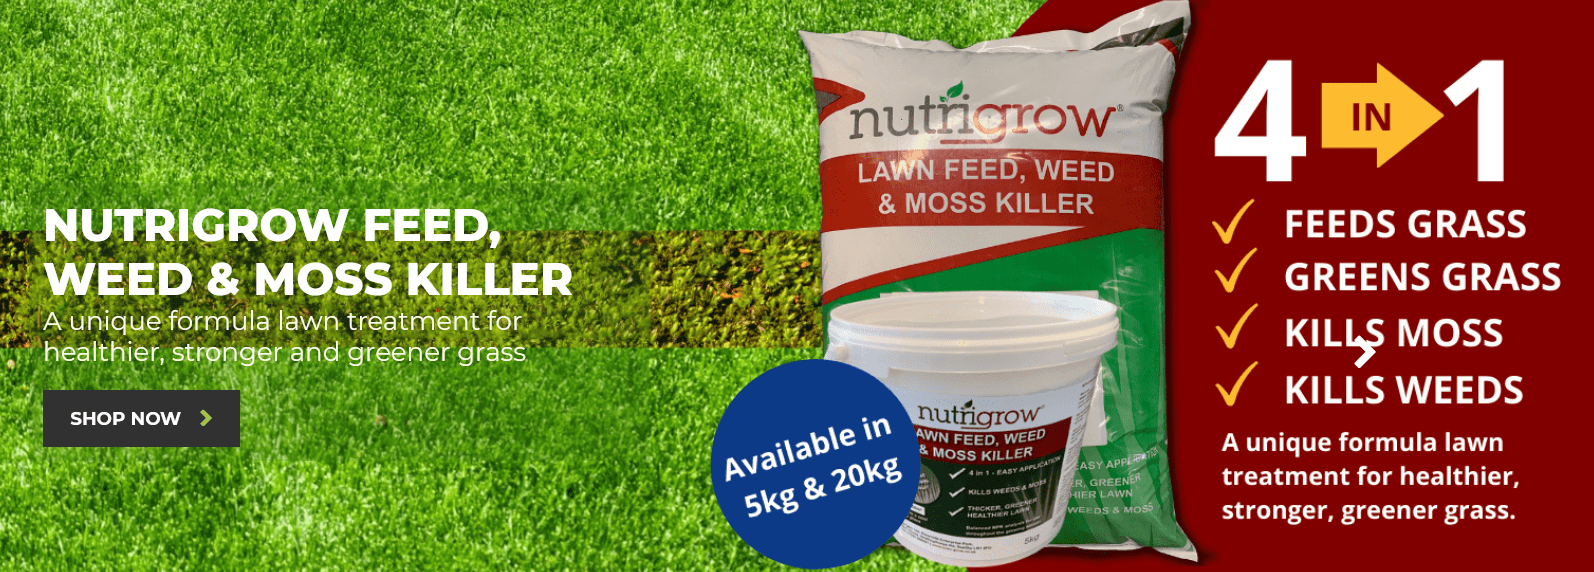 Introducing Nutrigrow Feed Weed & Moss Killer